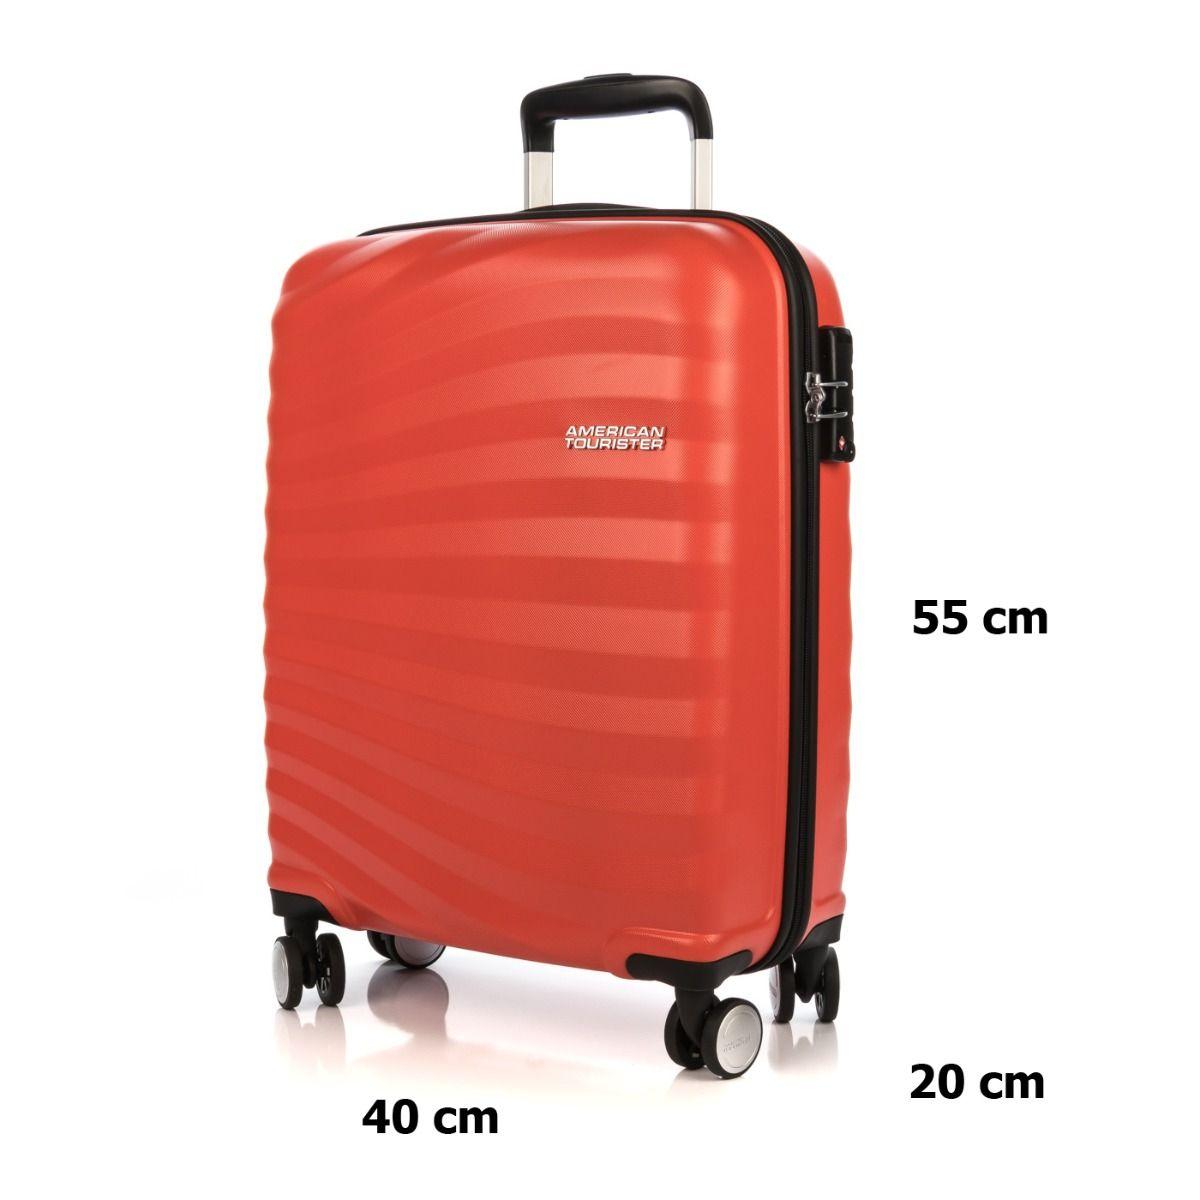 214ebbff832fb8 AMERICAN TOURISTER OCEANFRONT 31G901-96|bagaglio a mano arancione|Shop  online|Shoe Center